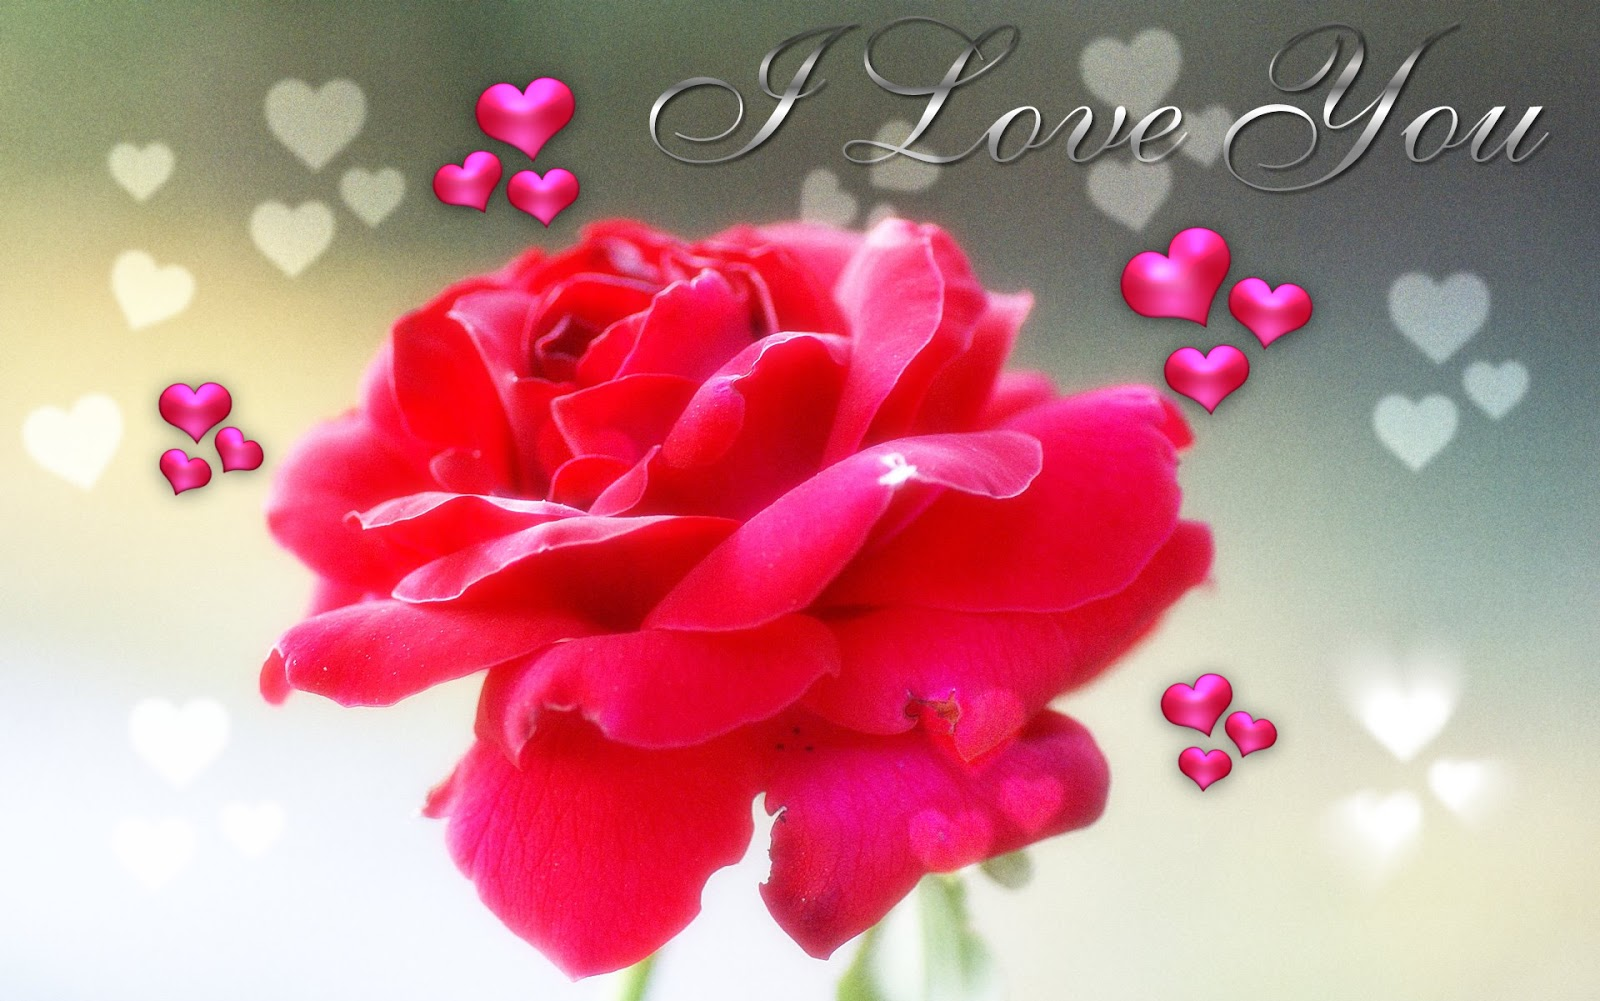 Beautiful Rose for I Love You Wallpaper